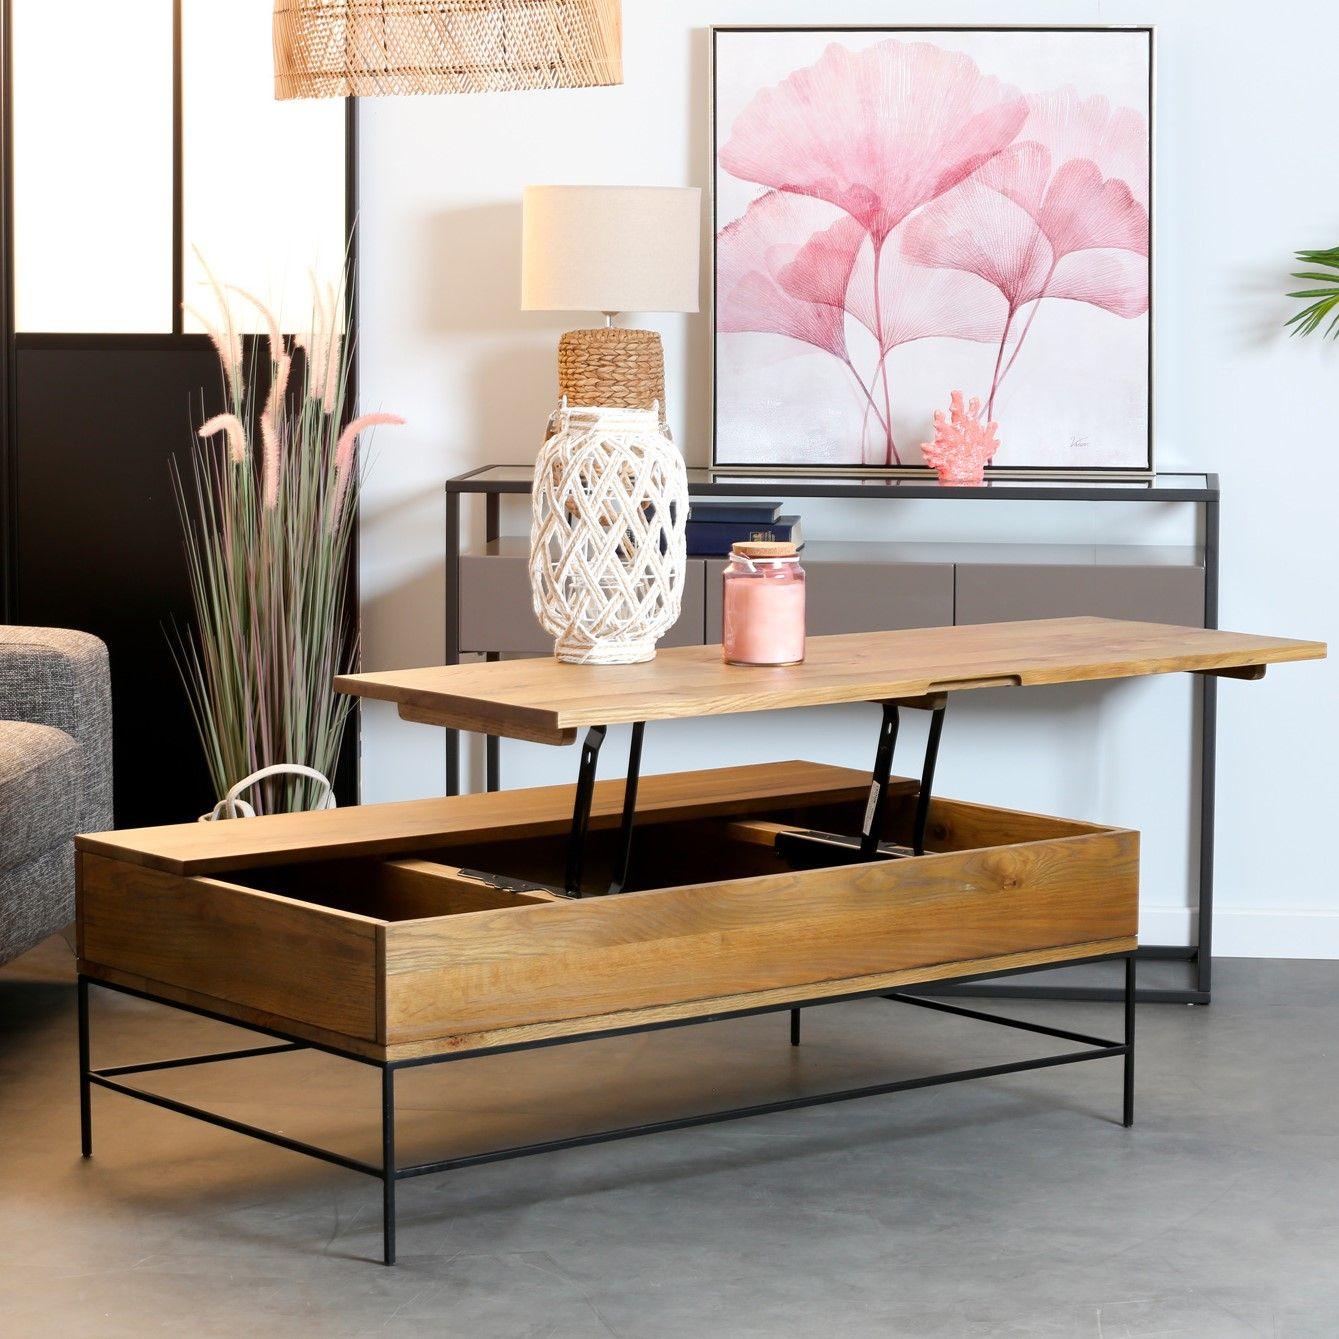 Table Basse Relevable Chene Massif Hudson En 2020 Table Basse Relevable Table Basse Table Basse Rectangulaire